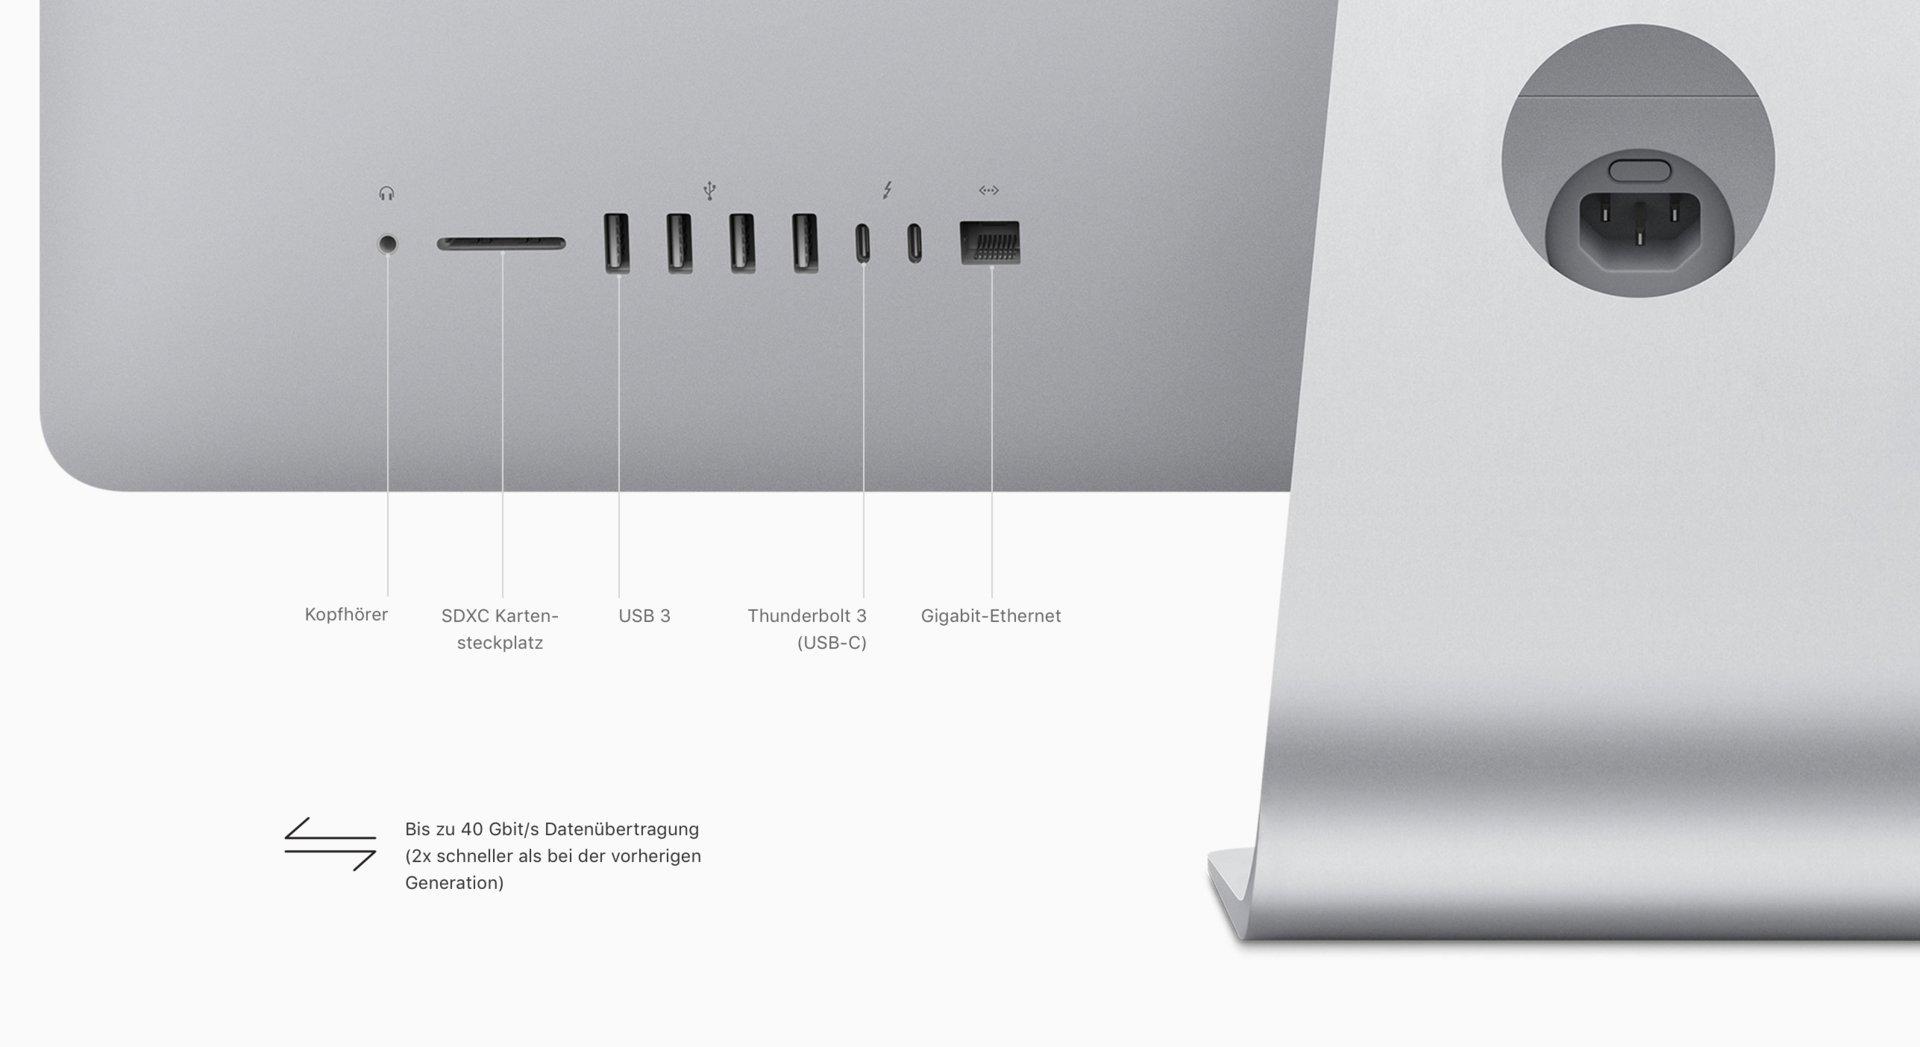 Anschlüsse am neuen iMac (Mid 2017)